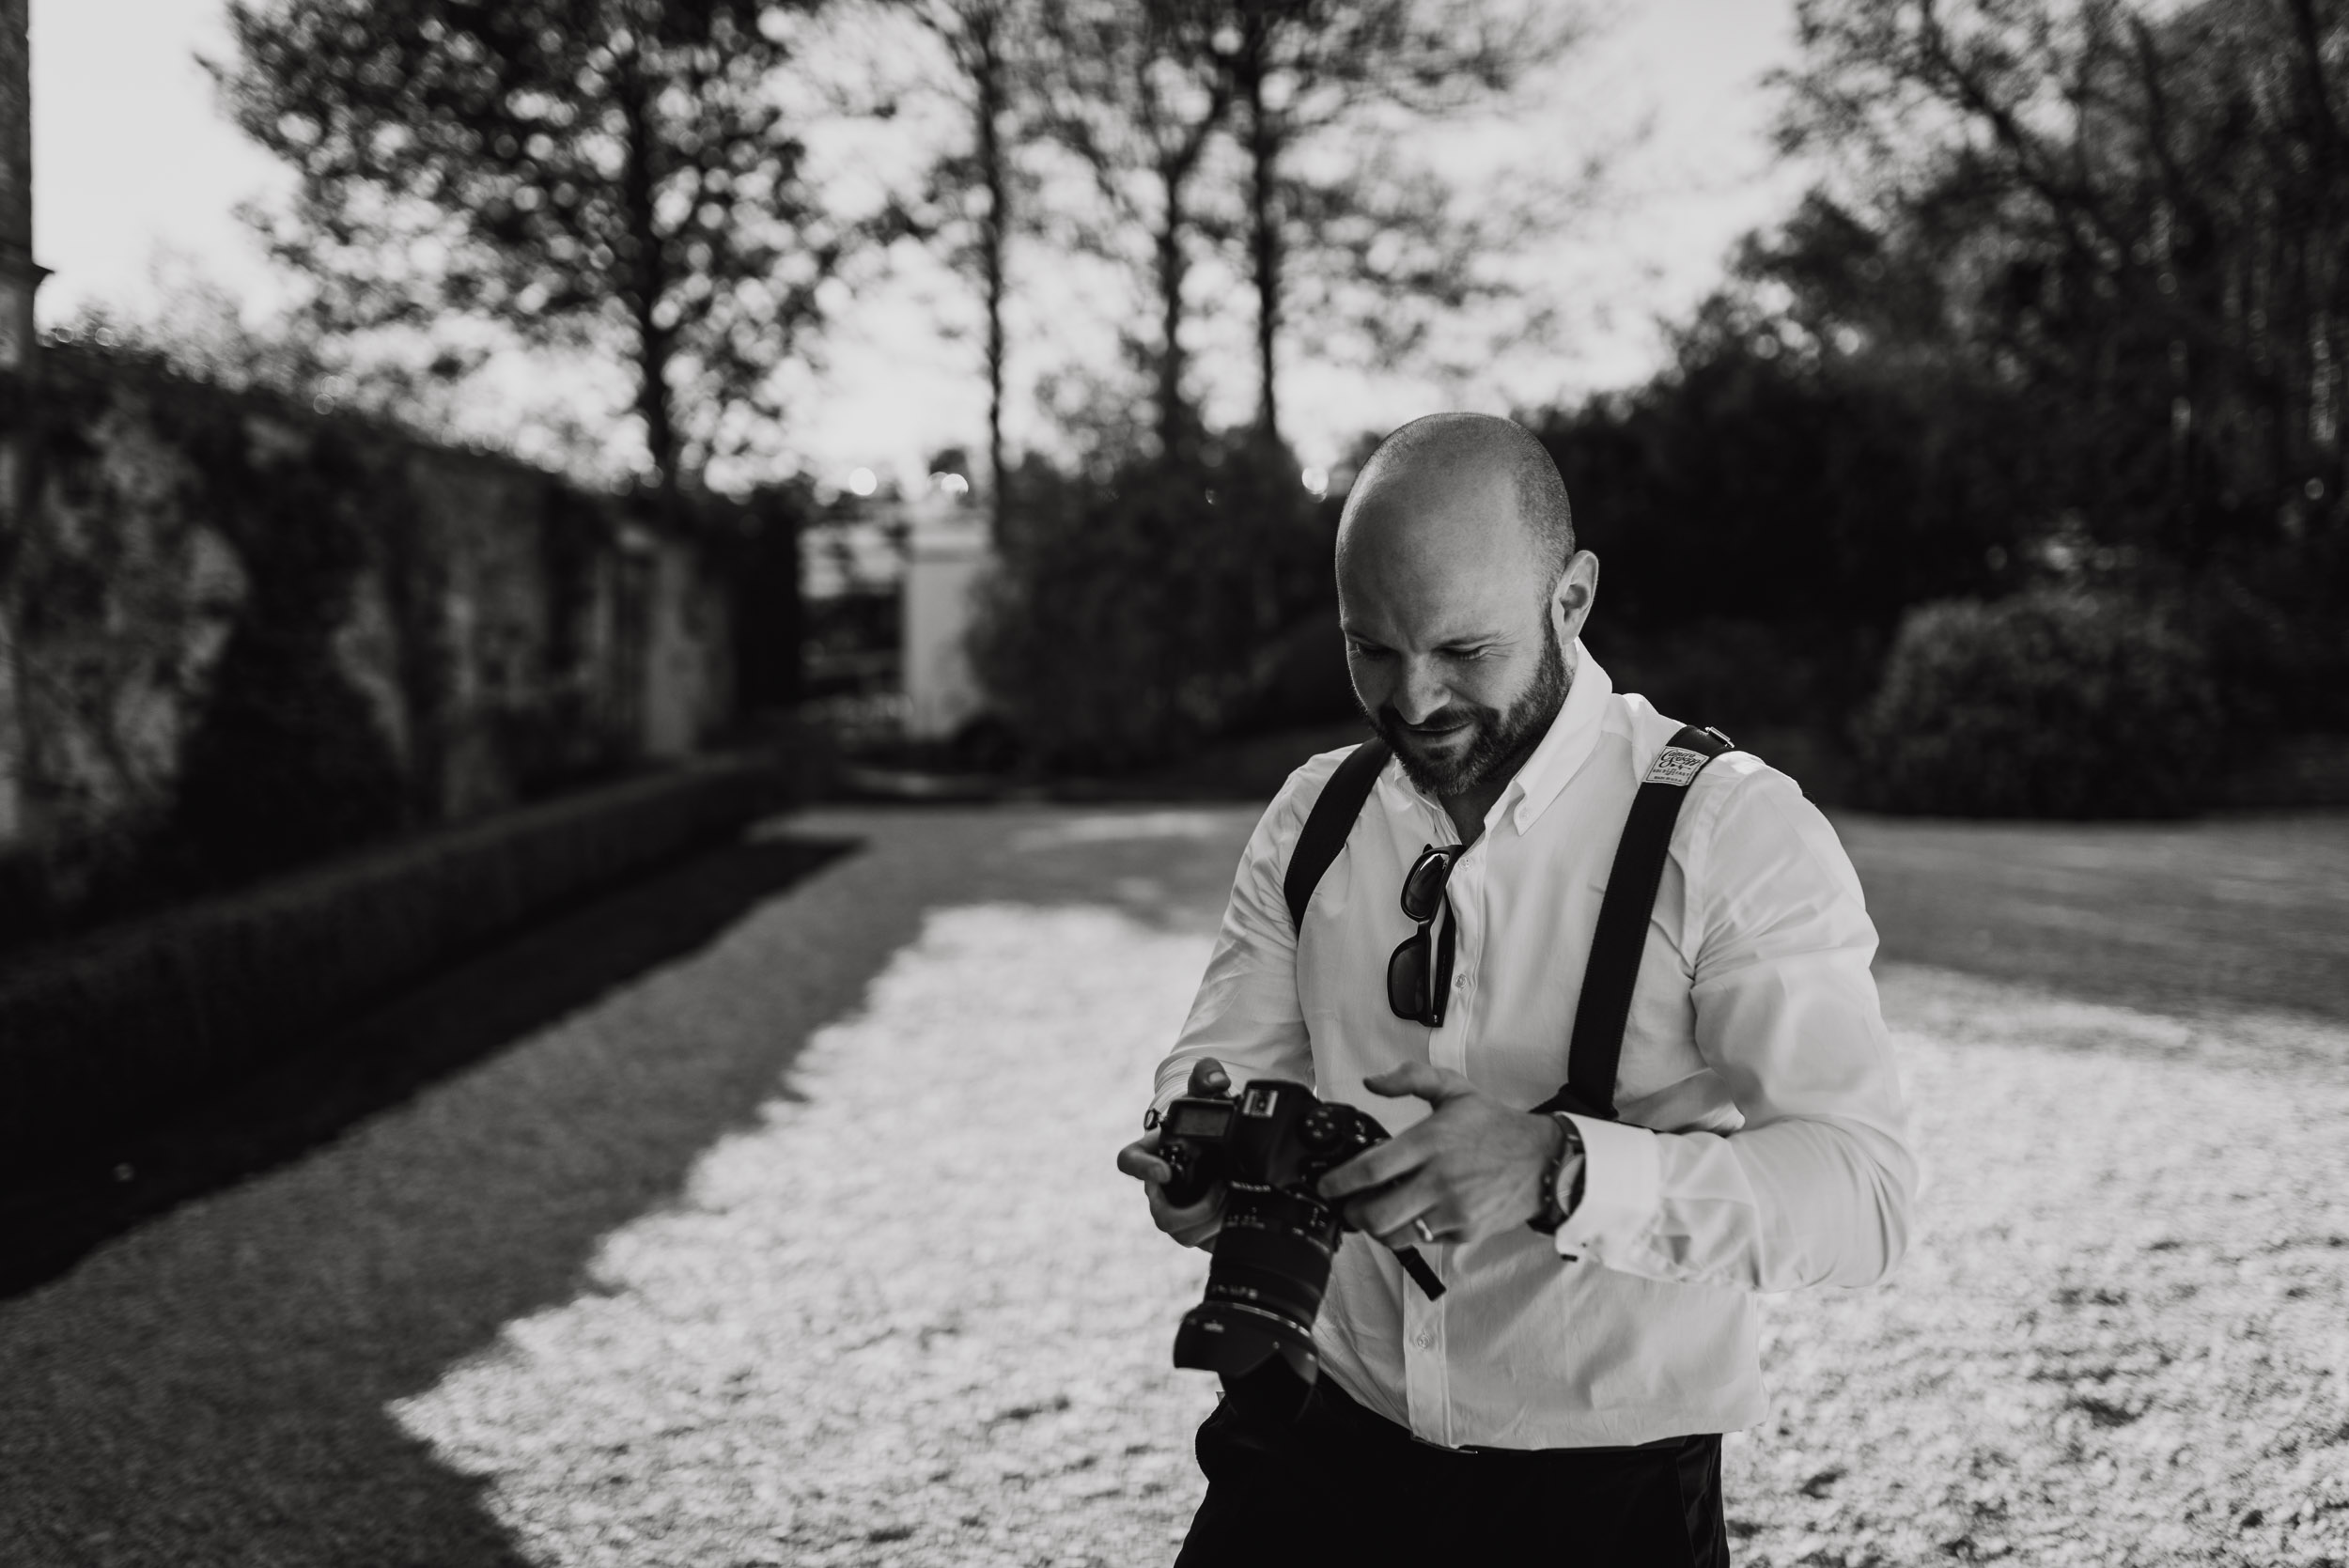 hamswell-house-wedding-photographer-me001.jpg